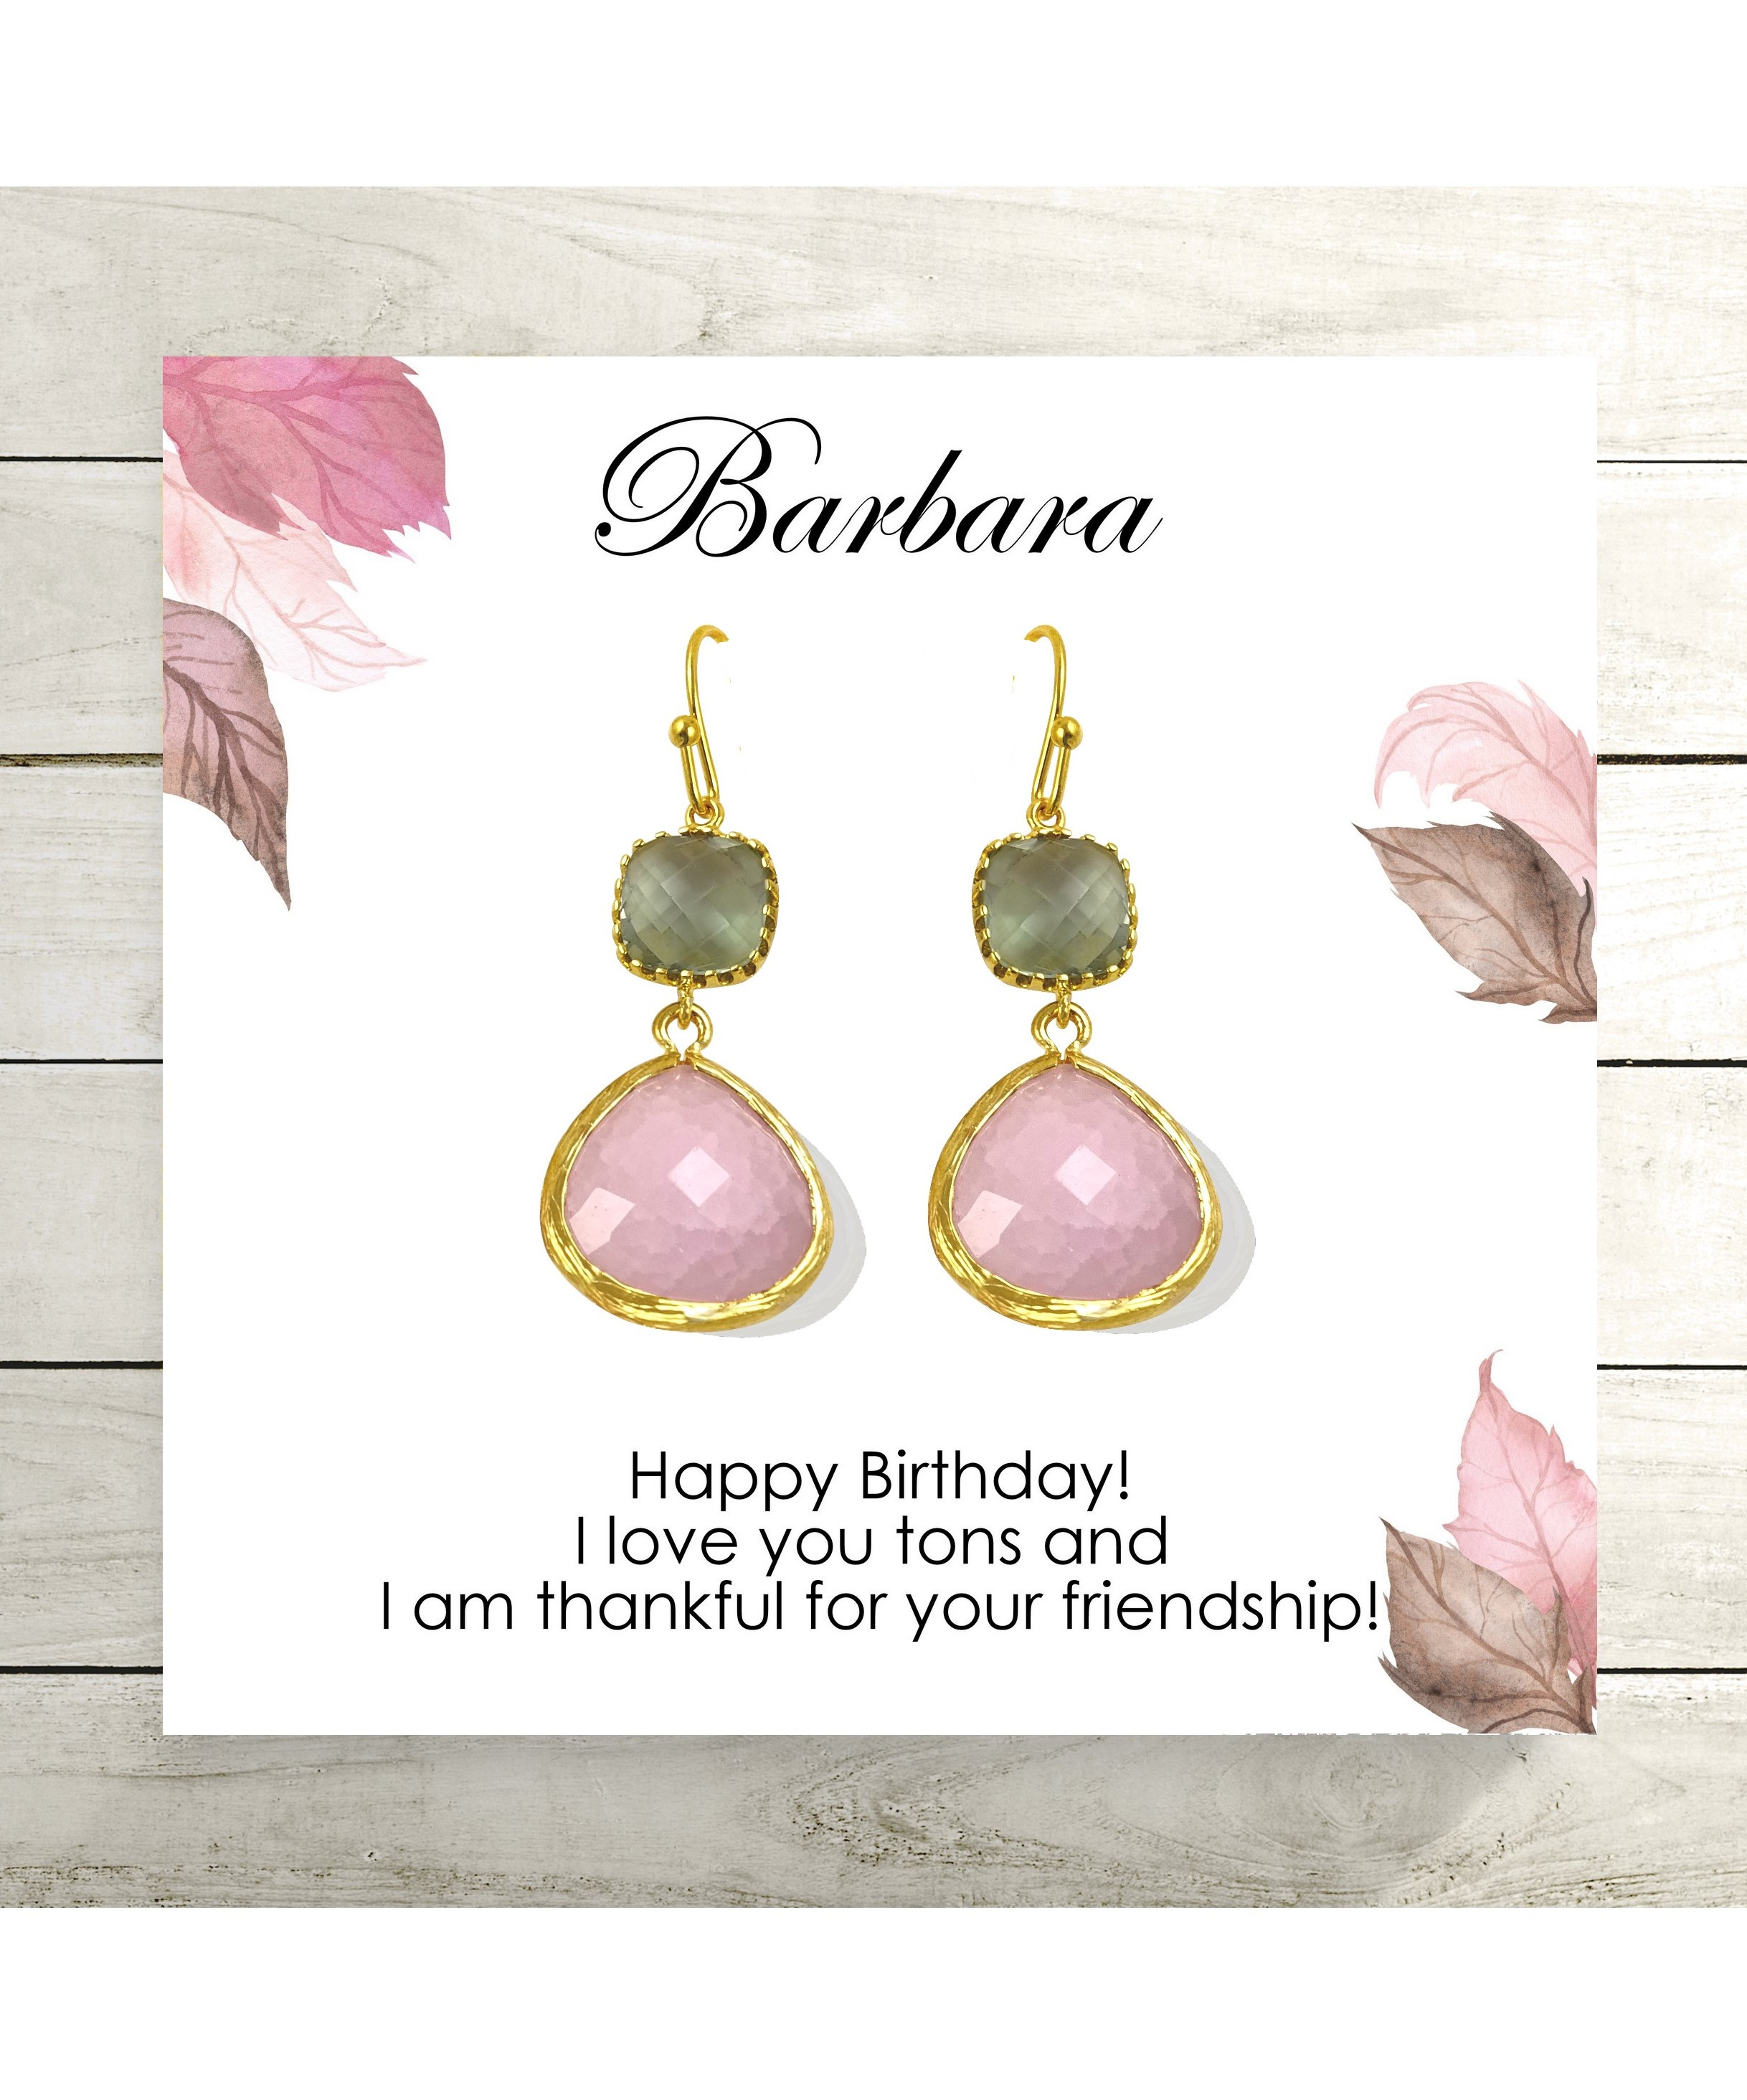 fa44d8b589ec0f Light Pink and Gray Dangle Earrings / Best Friend Birthday Gift Idea ...